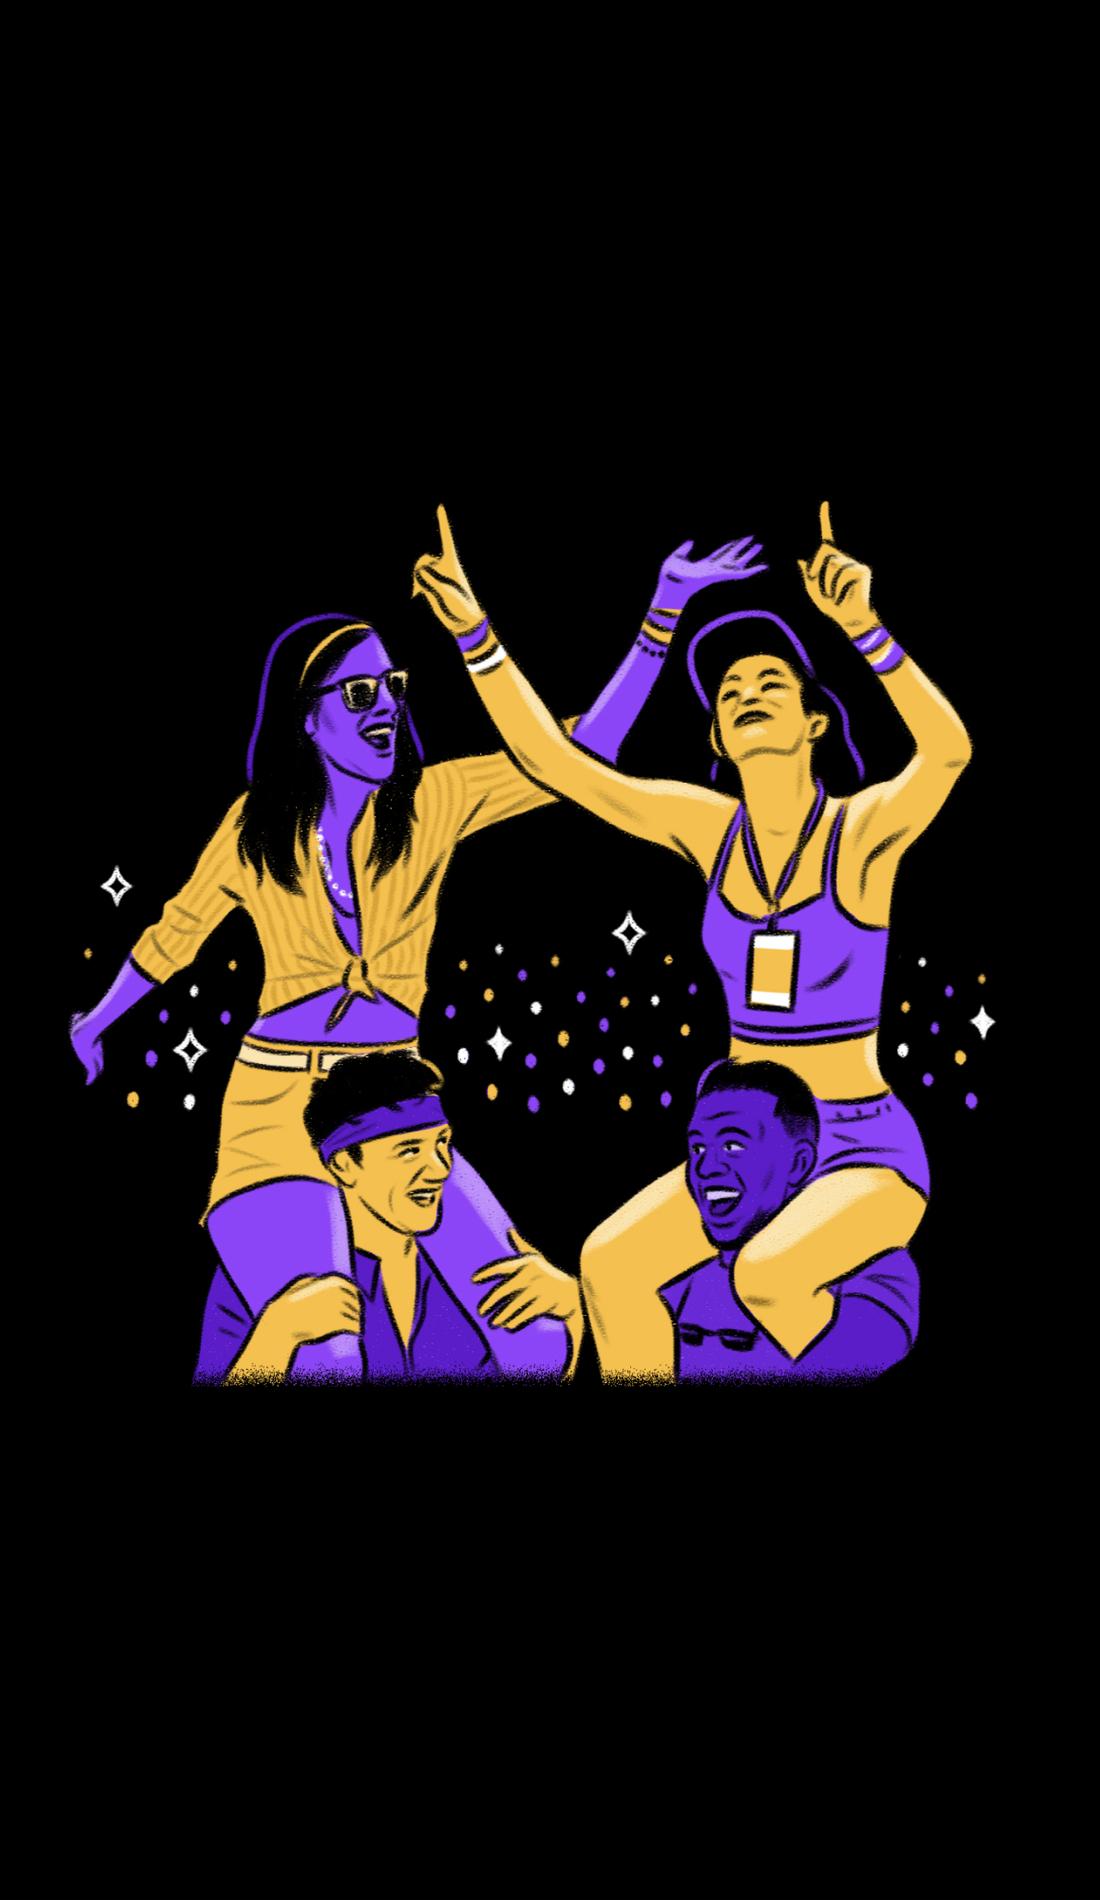 A Treasure Island Music Festival live event